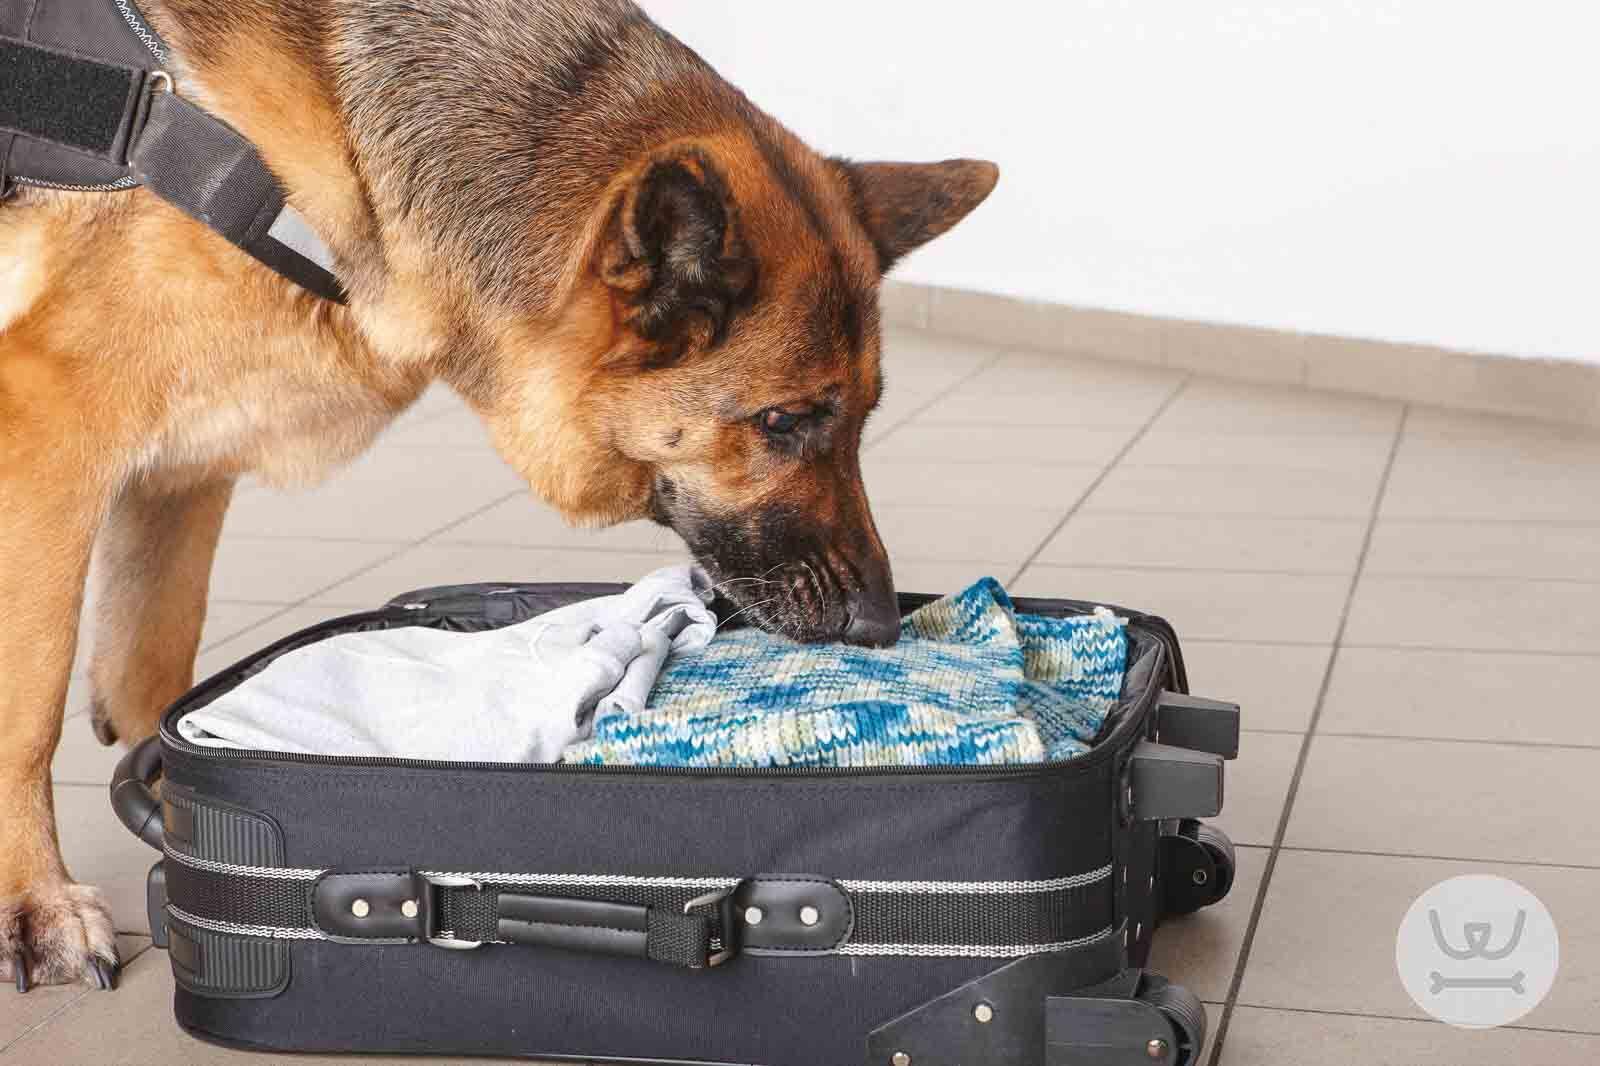 Woofland - σκύλοι βοηθοί και σκύλοι εργασίας